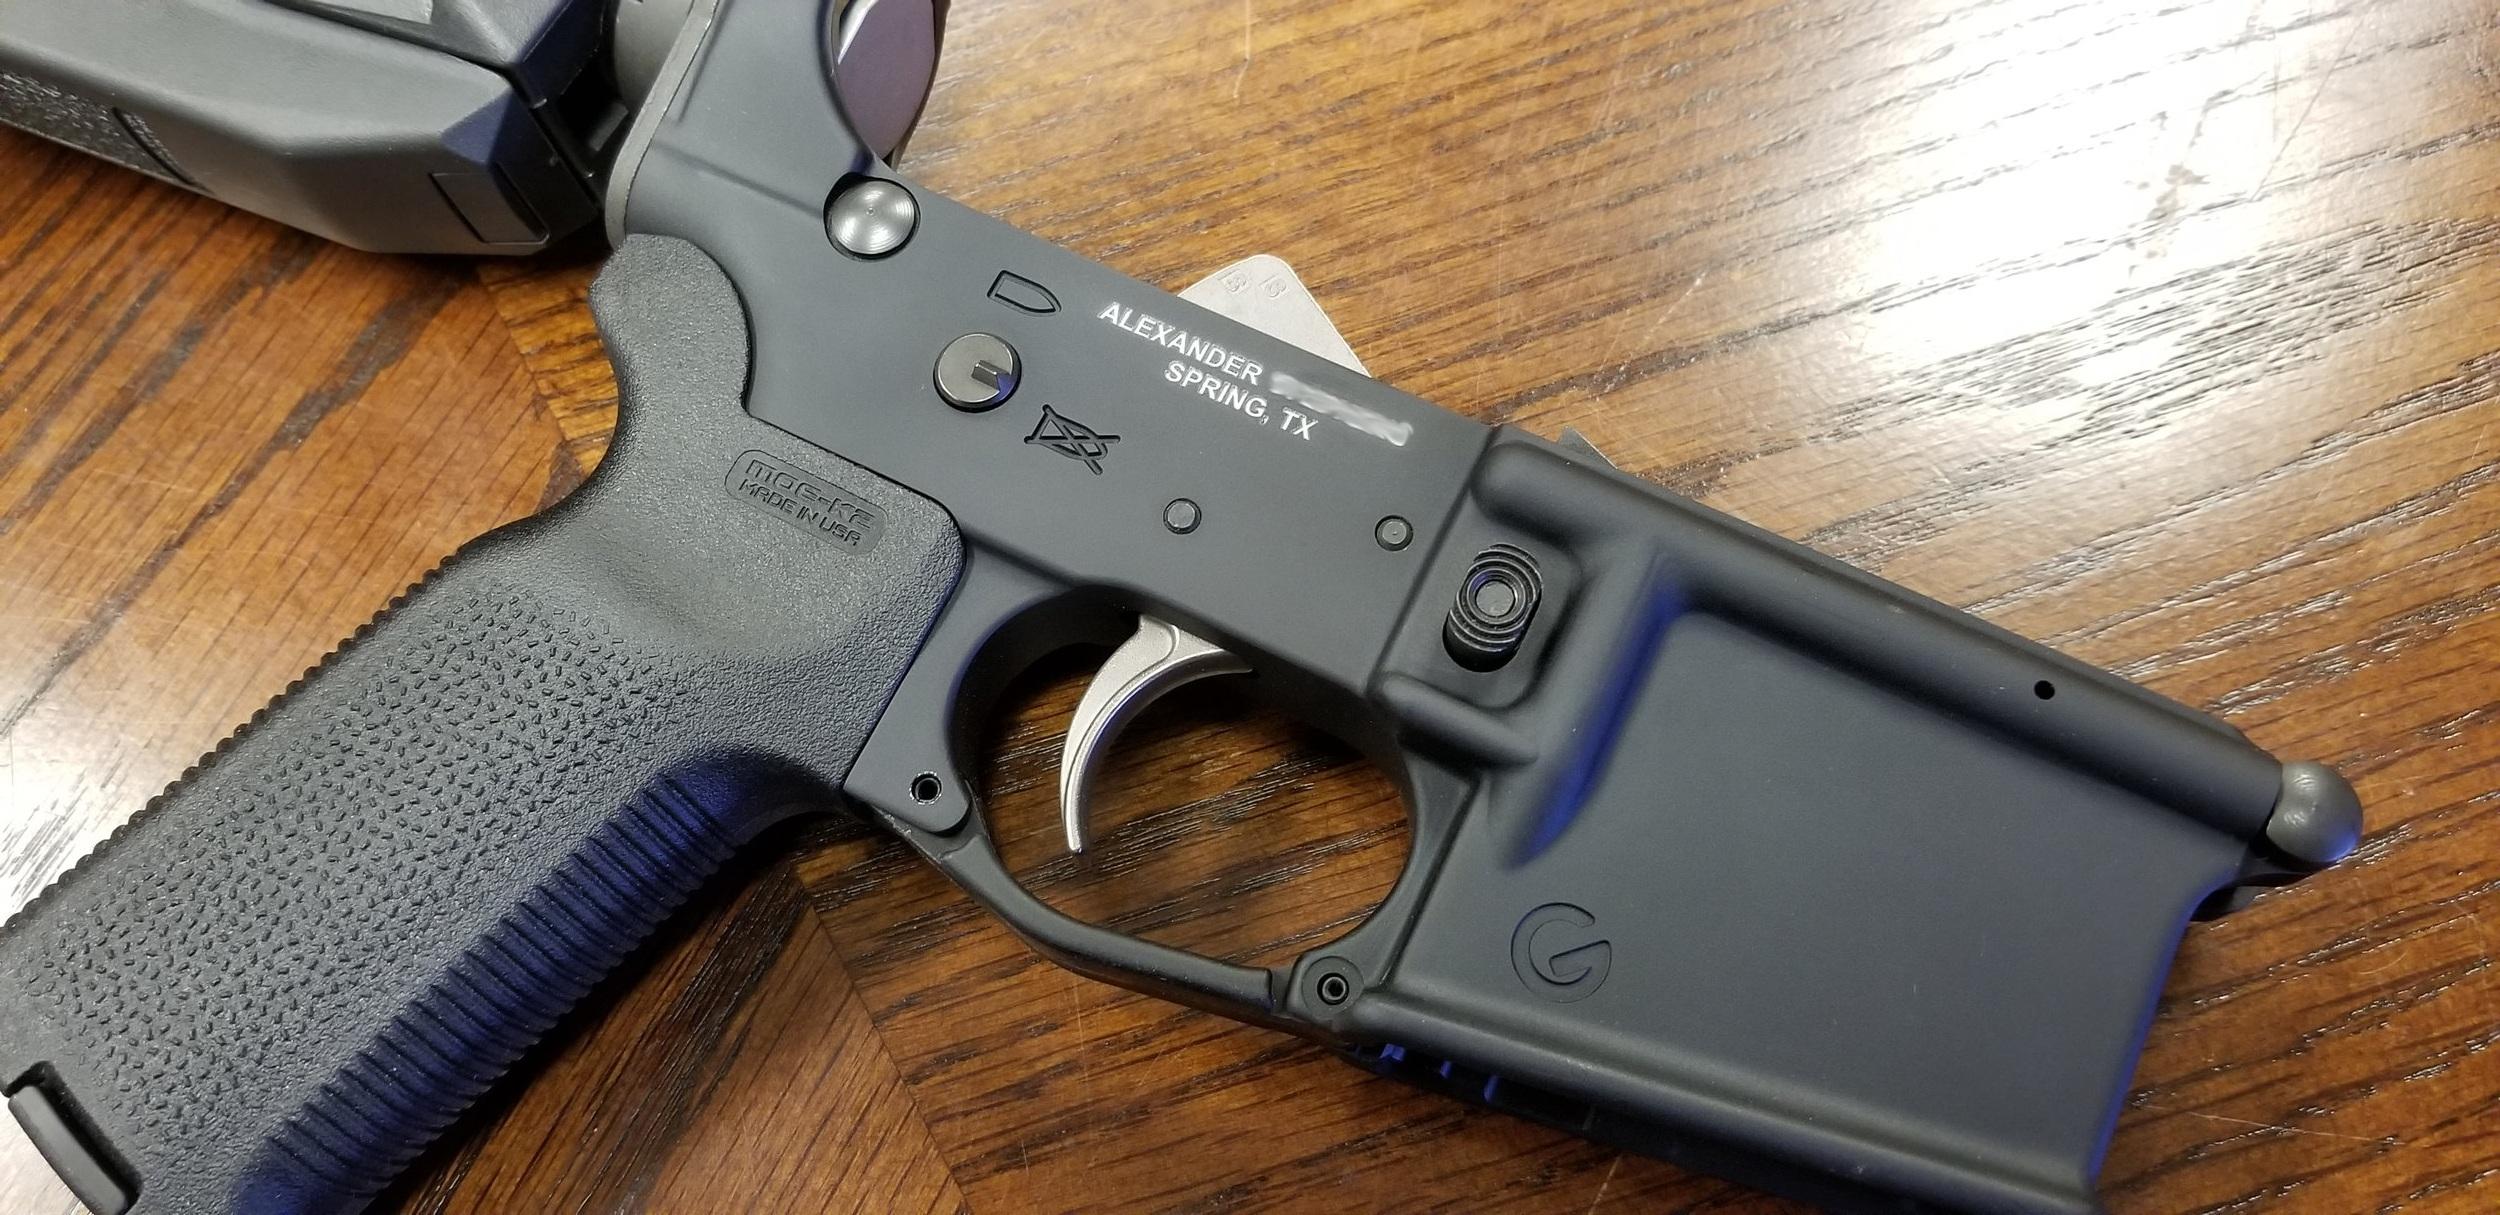 NFA Trust Engraving - NFA Engraving - ATF Engraving - Firearm Engraving - Engrave It Houston Firearms